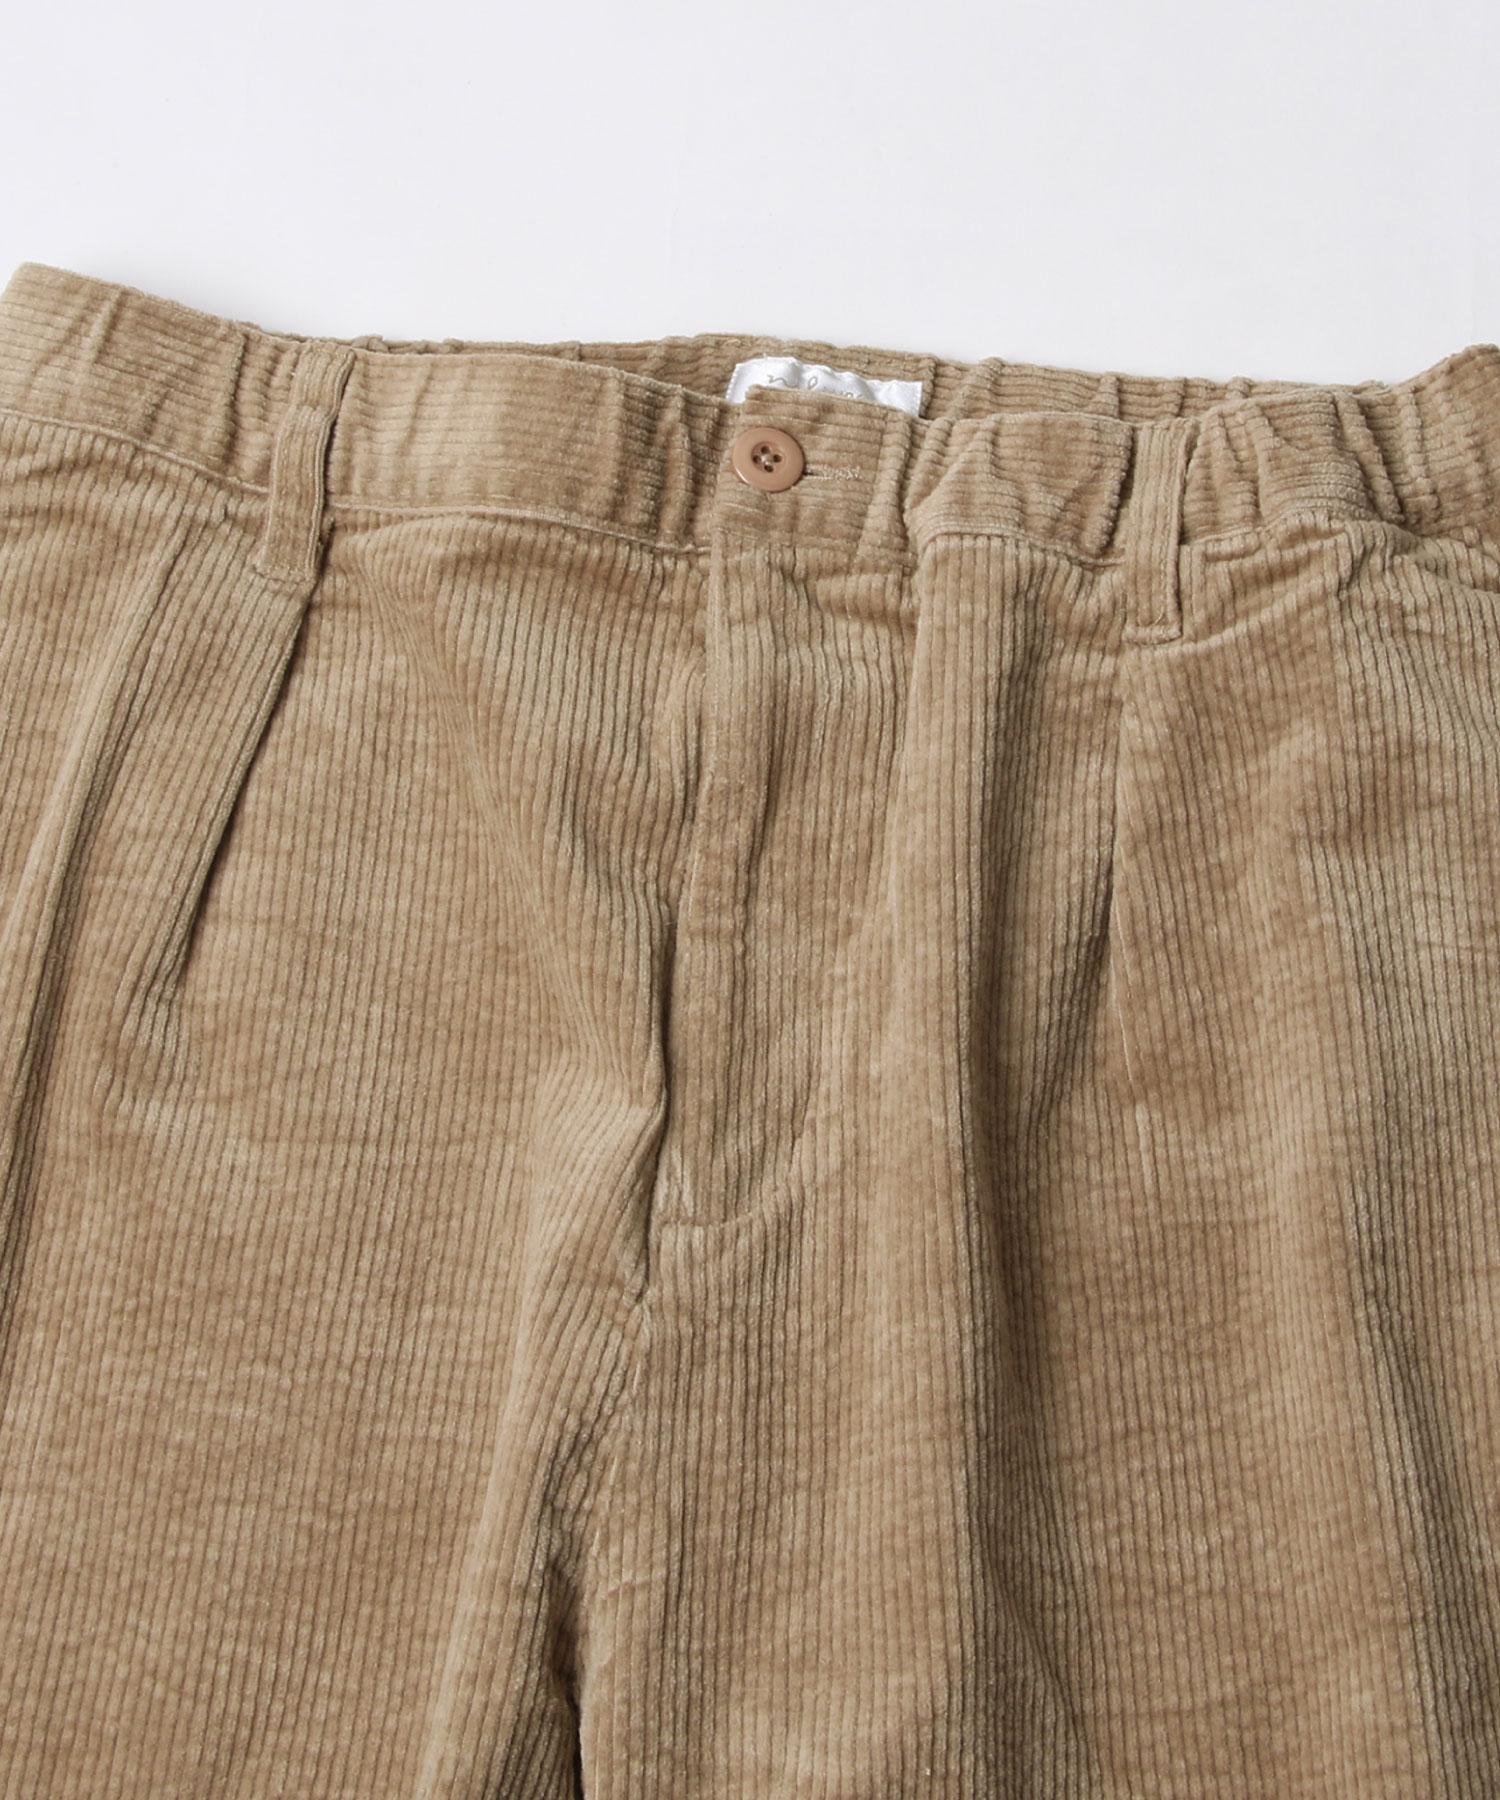 【Nilway】燈芯絨氣球褲 錐形褲 4